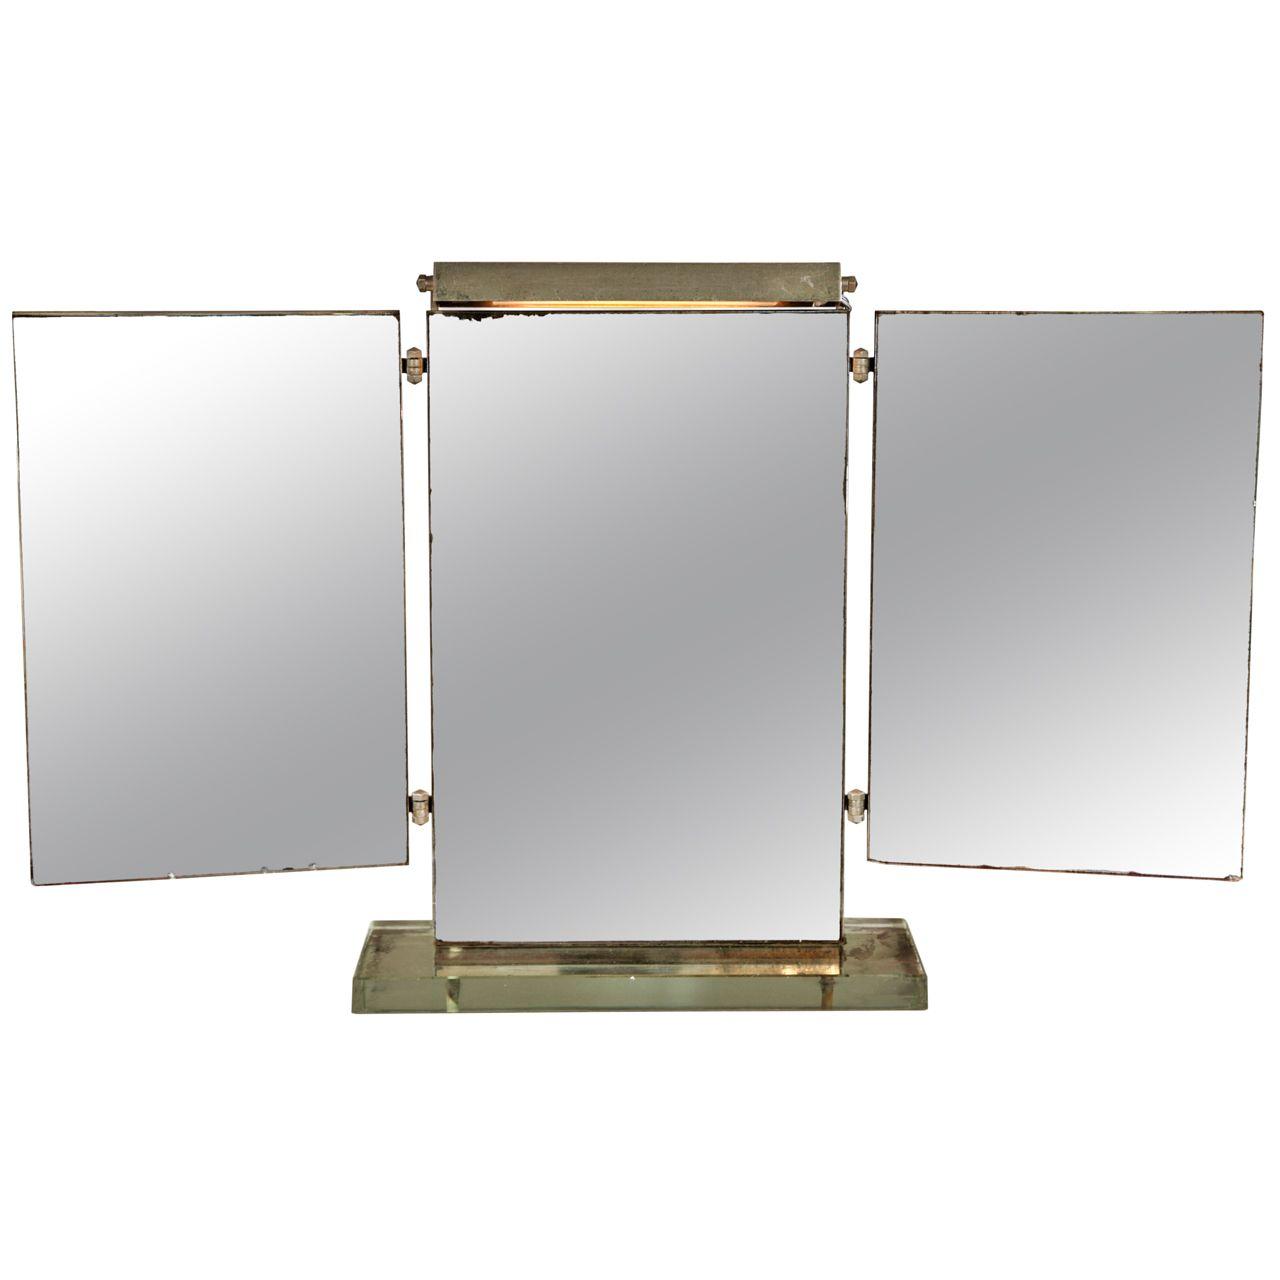 Modern dressing table mirrors s dressing tablevanity mirror  dressing table vanity table